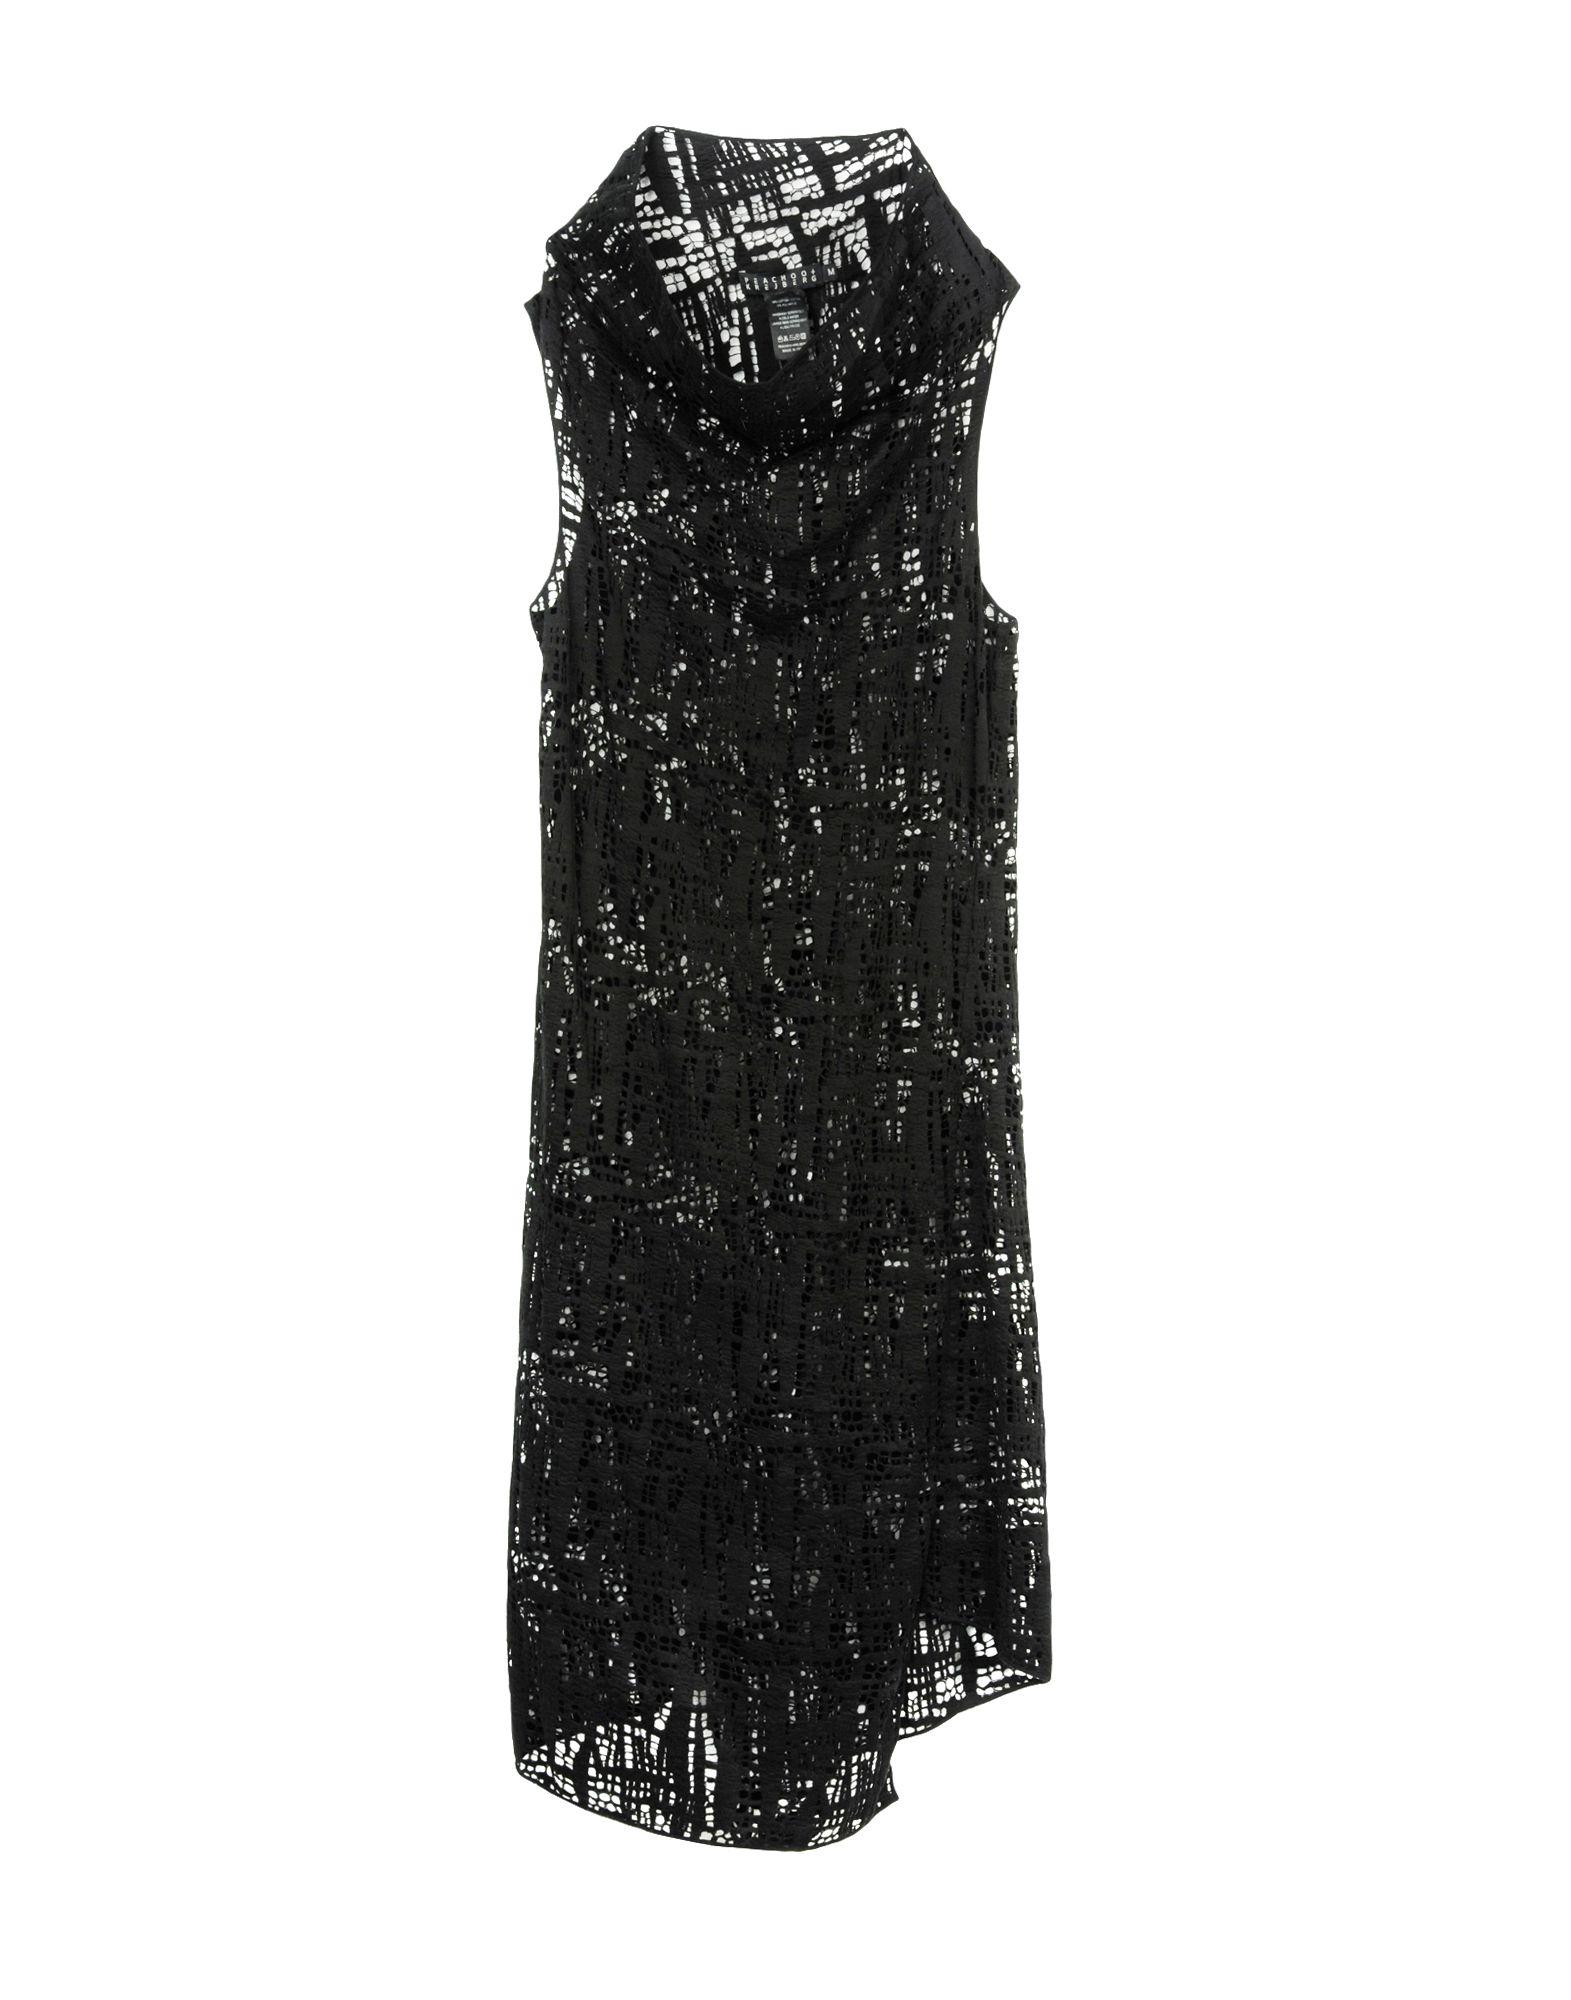 peachoo krejberg короткое платье PEACHOO+KREJBERG Платье длиной 3/4